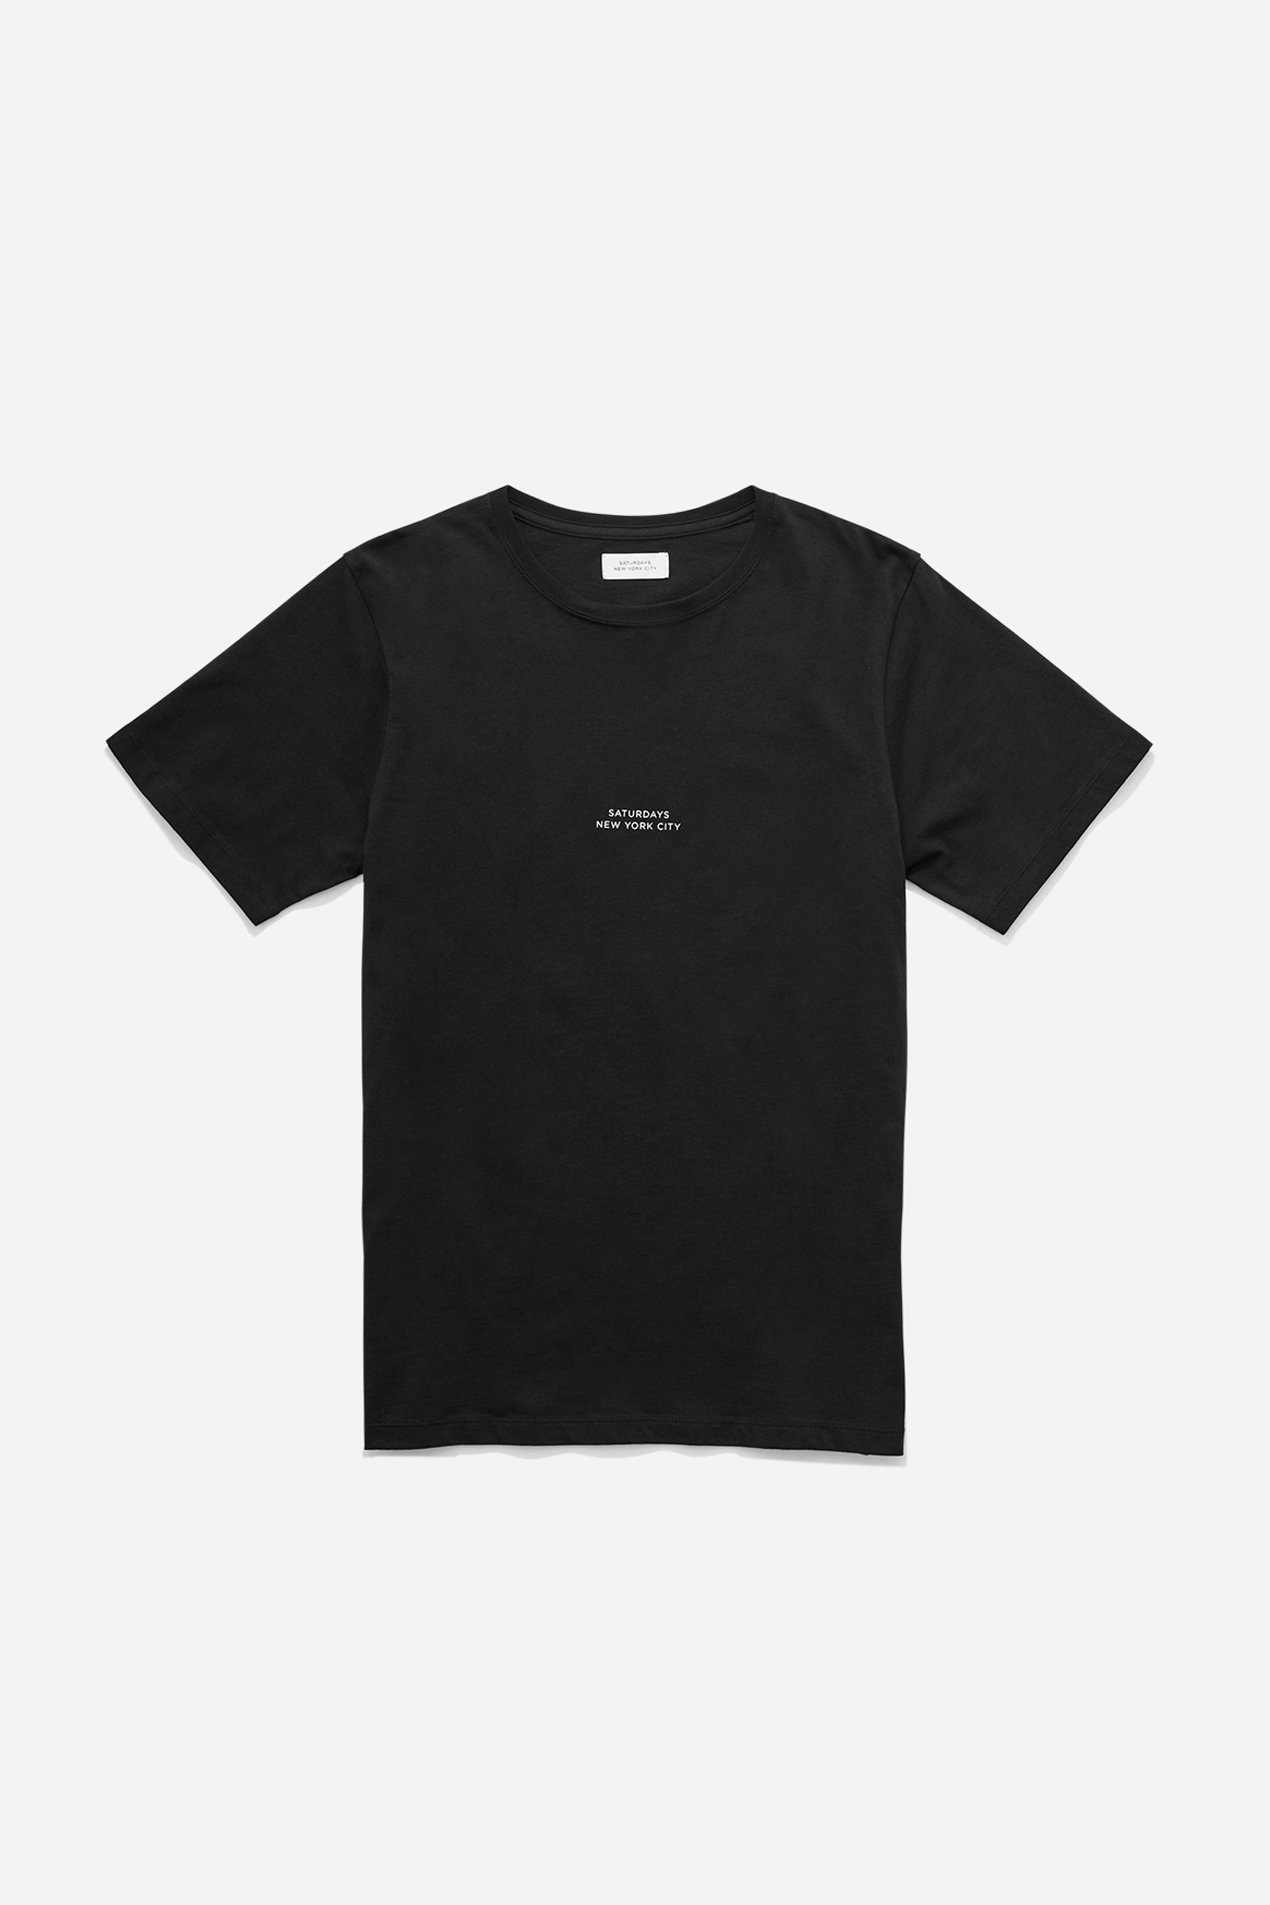 gotham chest t-shirt black.jpg